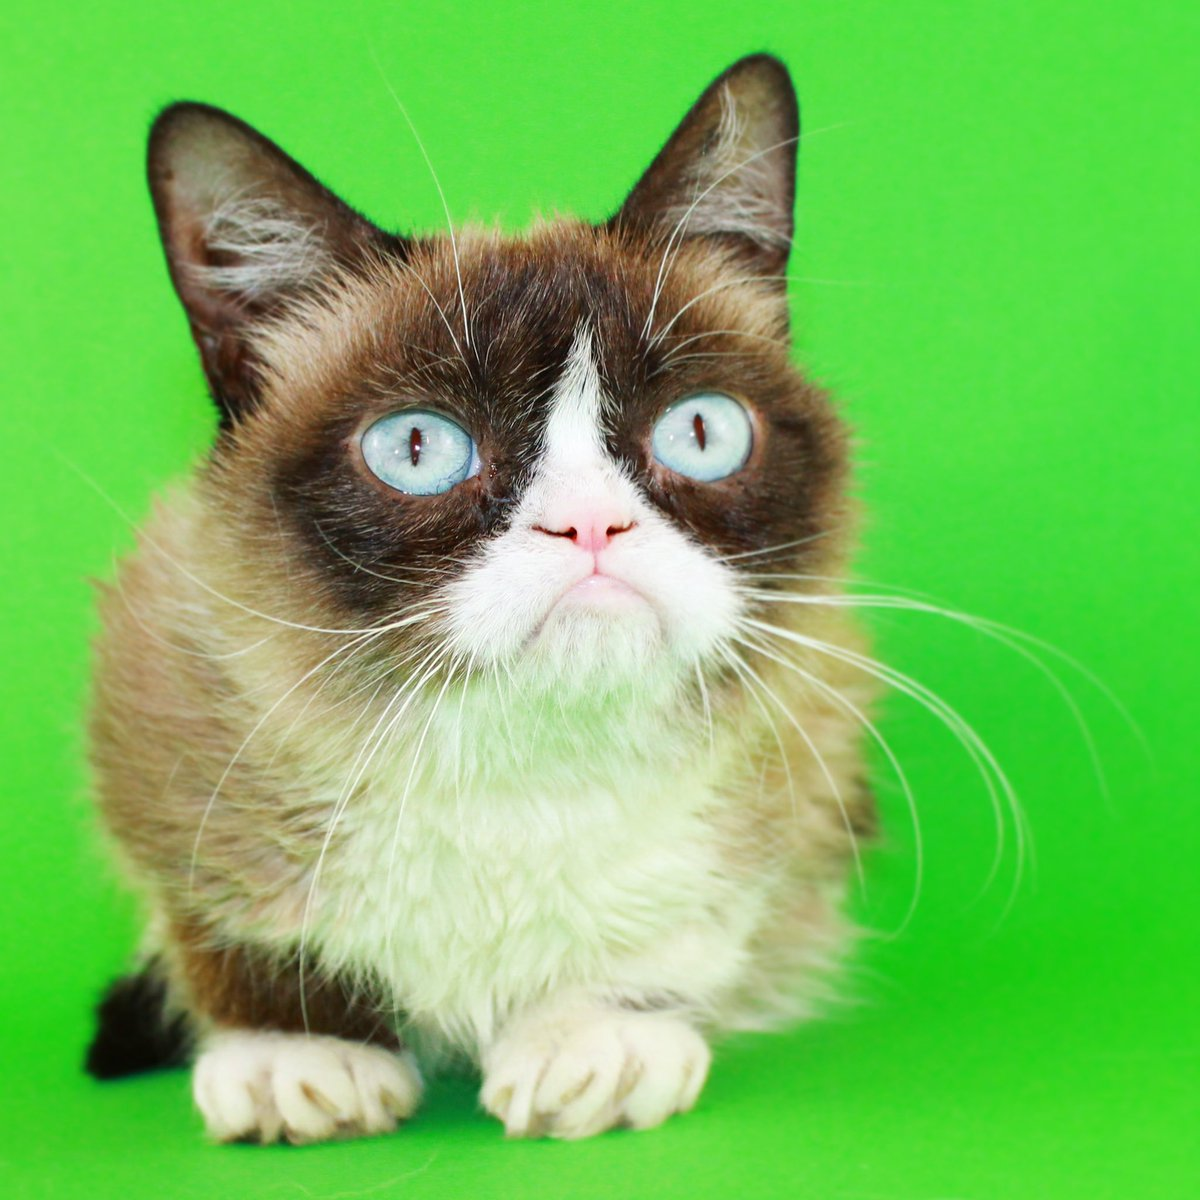 Image of: Movie Grumpy Cat Followed Twitter Grumpy Cat realgrumpycat Twitter